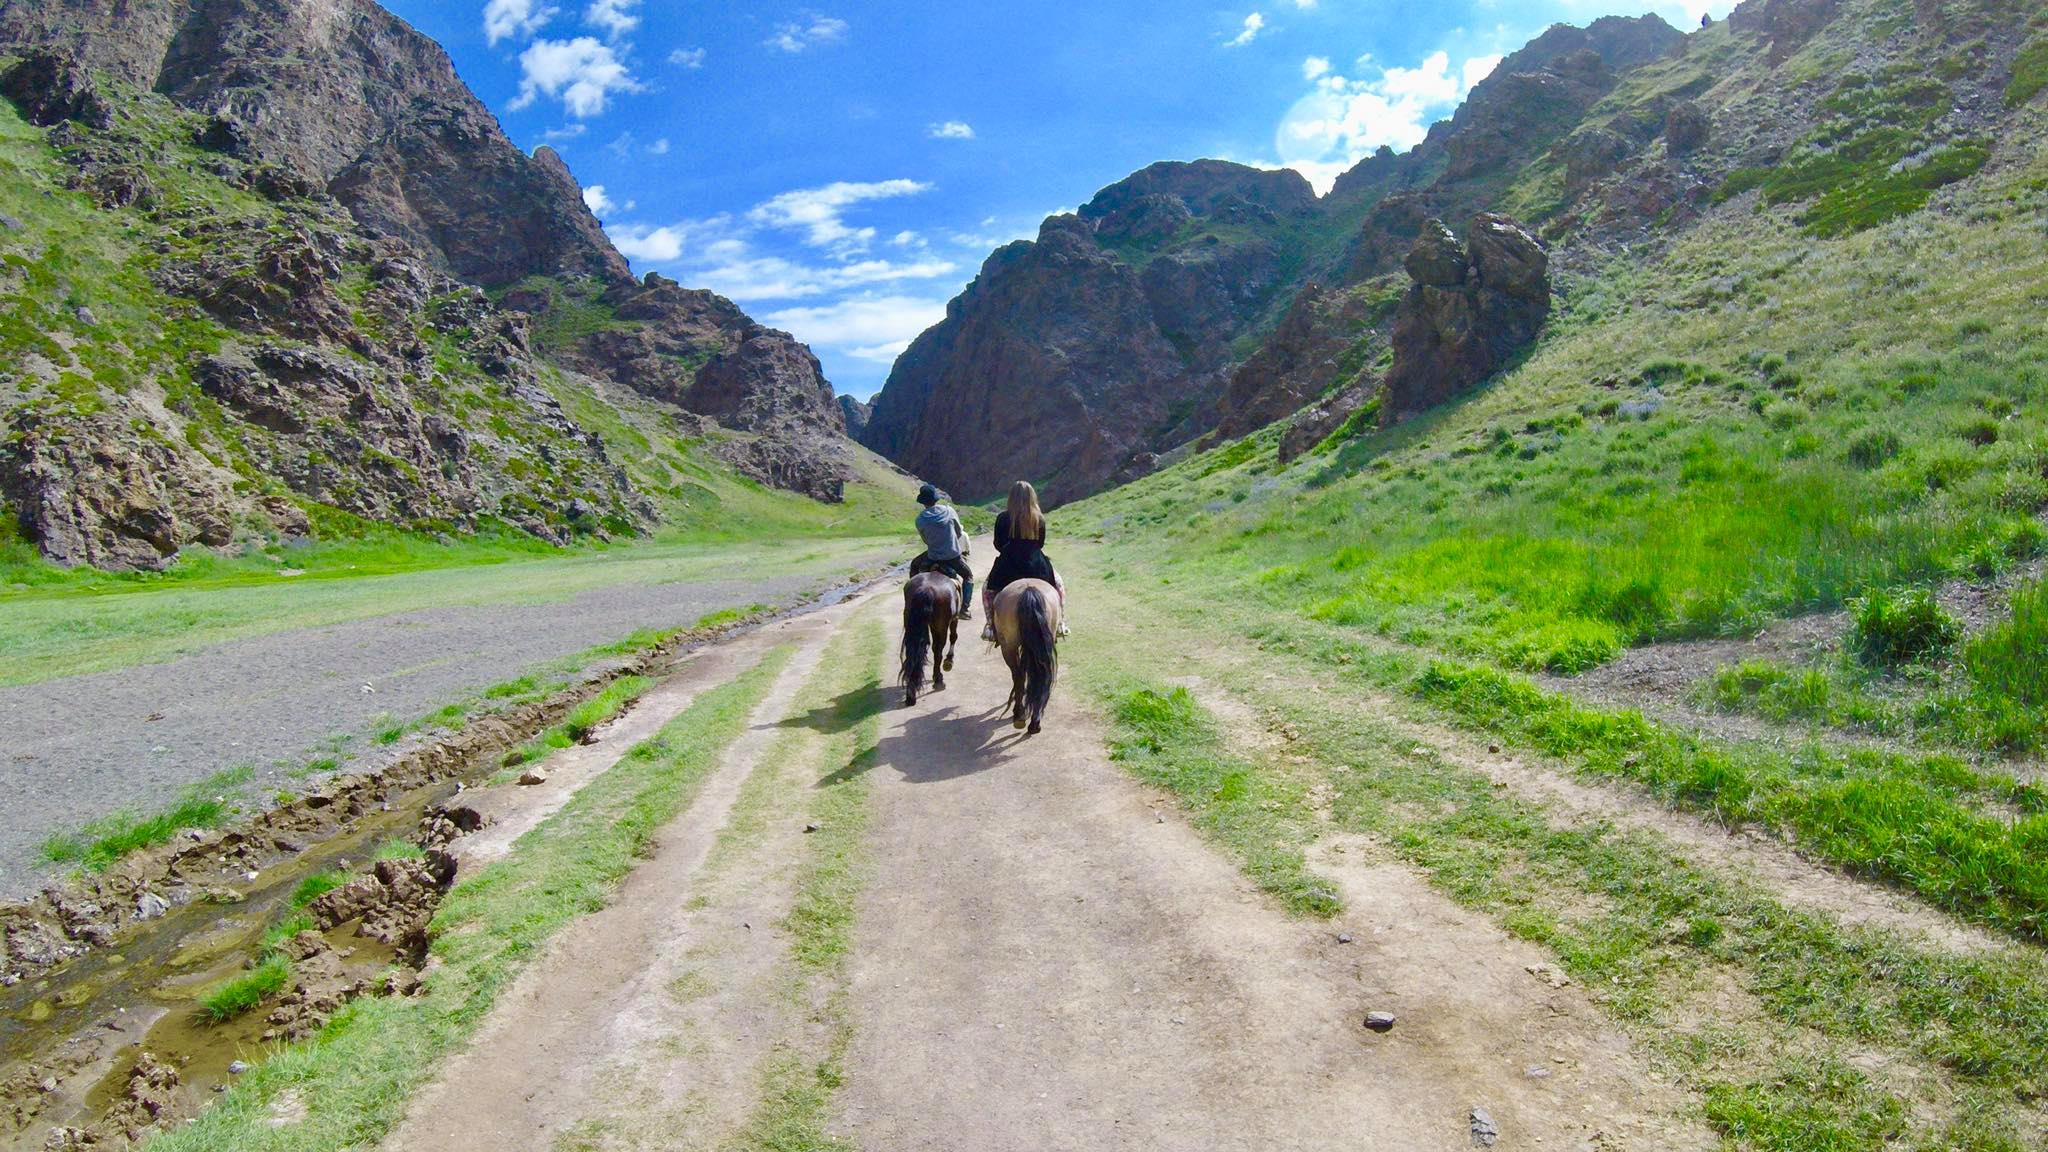 Kach Solo Travels in 2019 Horseback riding trip to the Gobi Gurvan Saikhan National Park11.jpg